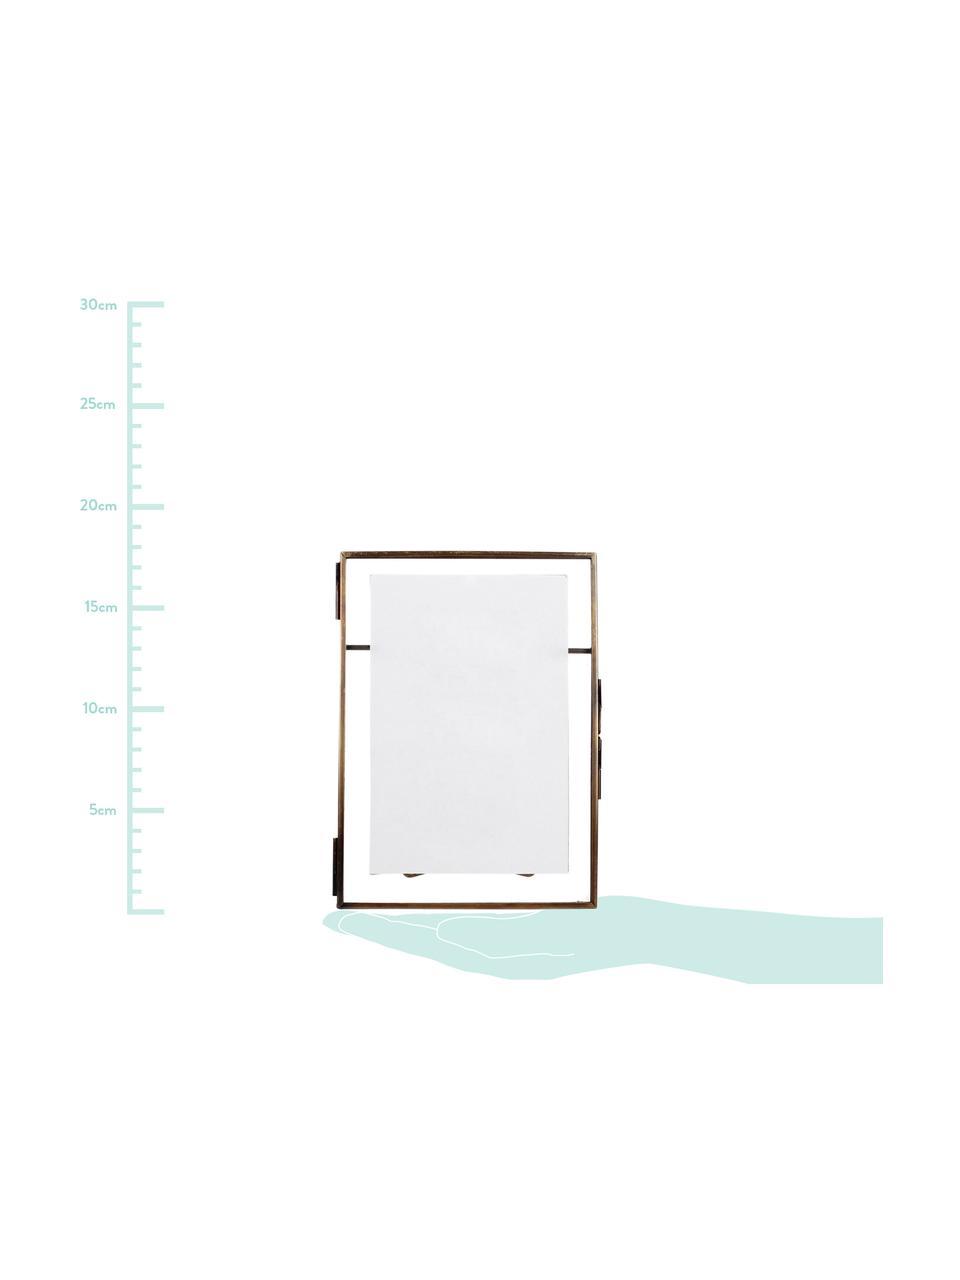 Ramka na zdjęcia Collector, Odcienie brązu, 10 x 15 cm